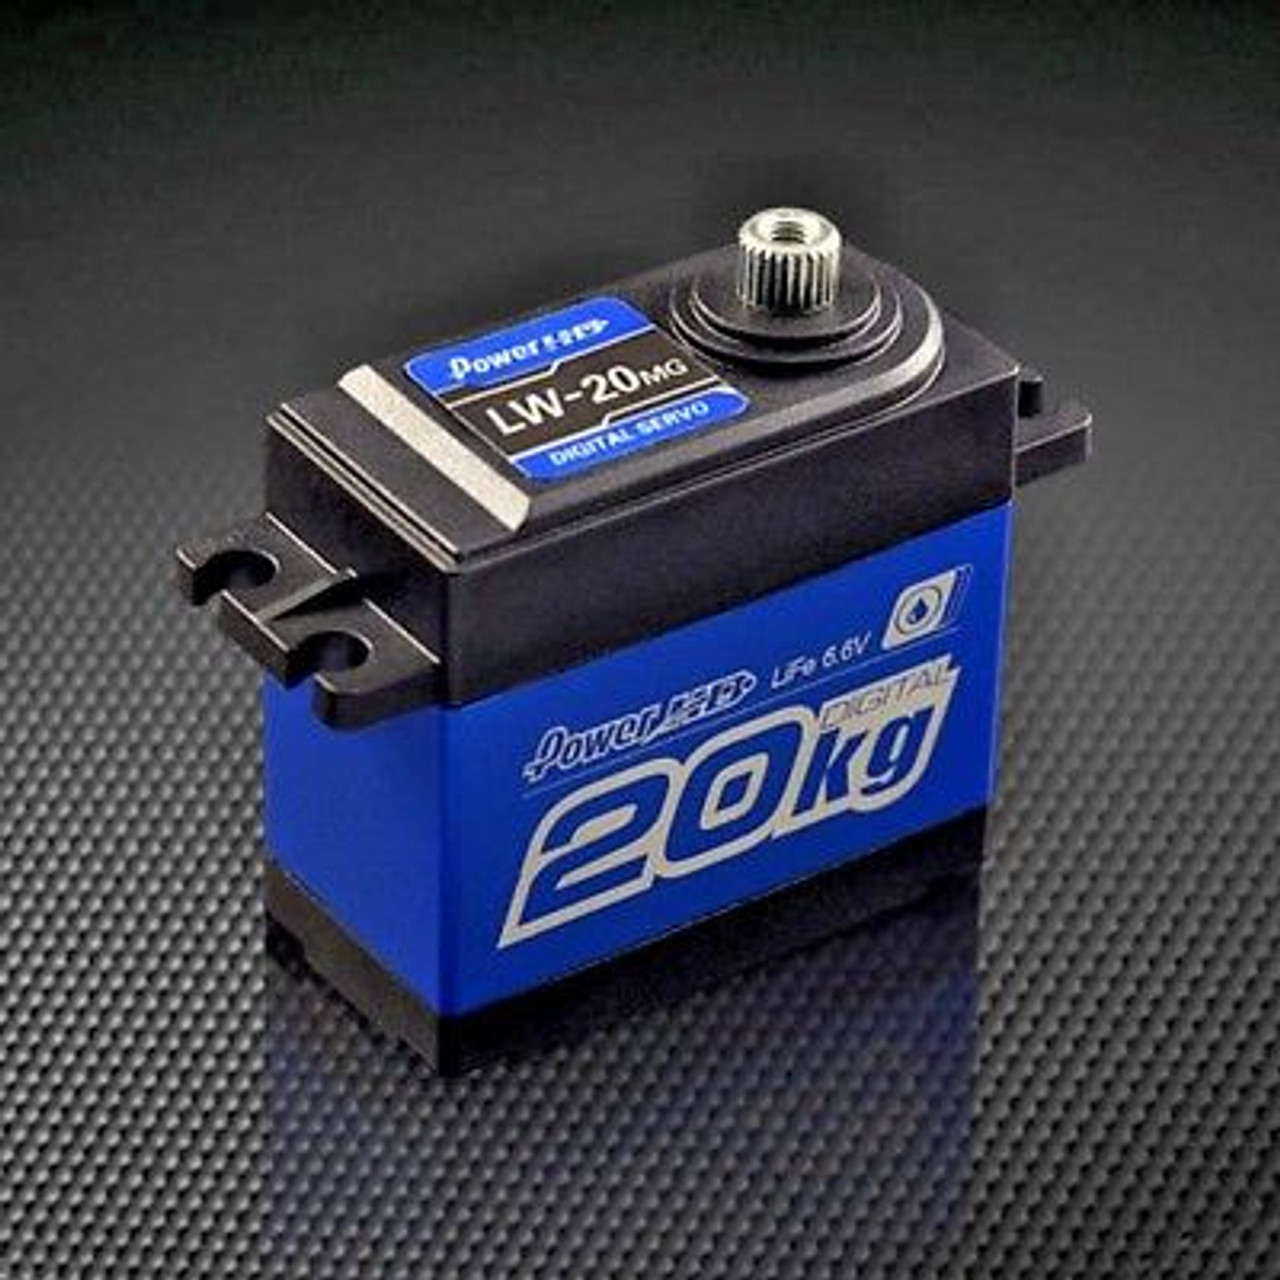 2075 SERVO WATERPROOF METAL Gear DIGITAL SERVO 20KG Slash 4X4 Rustler